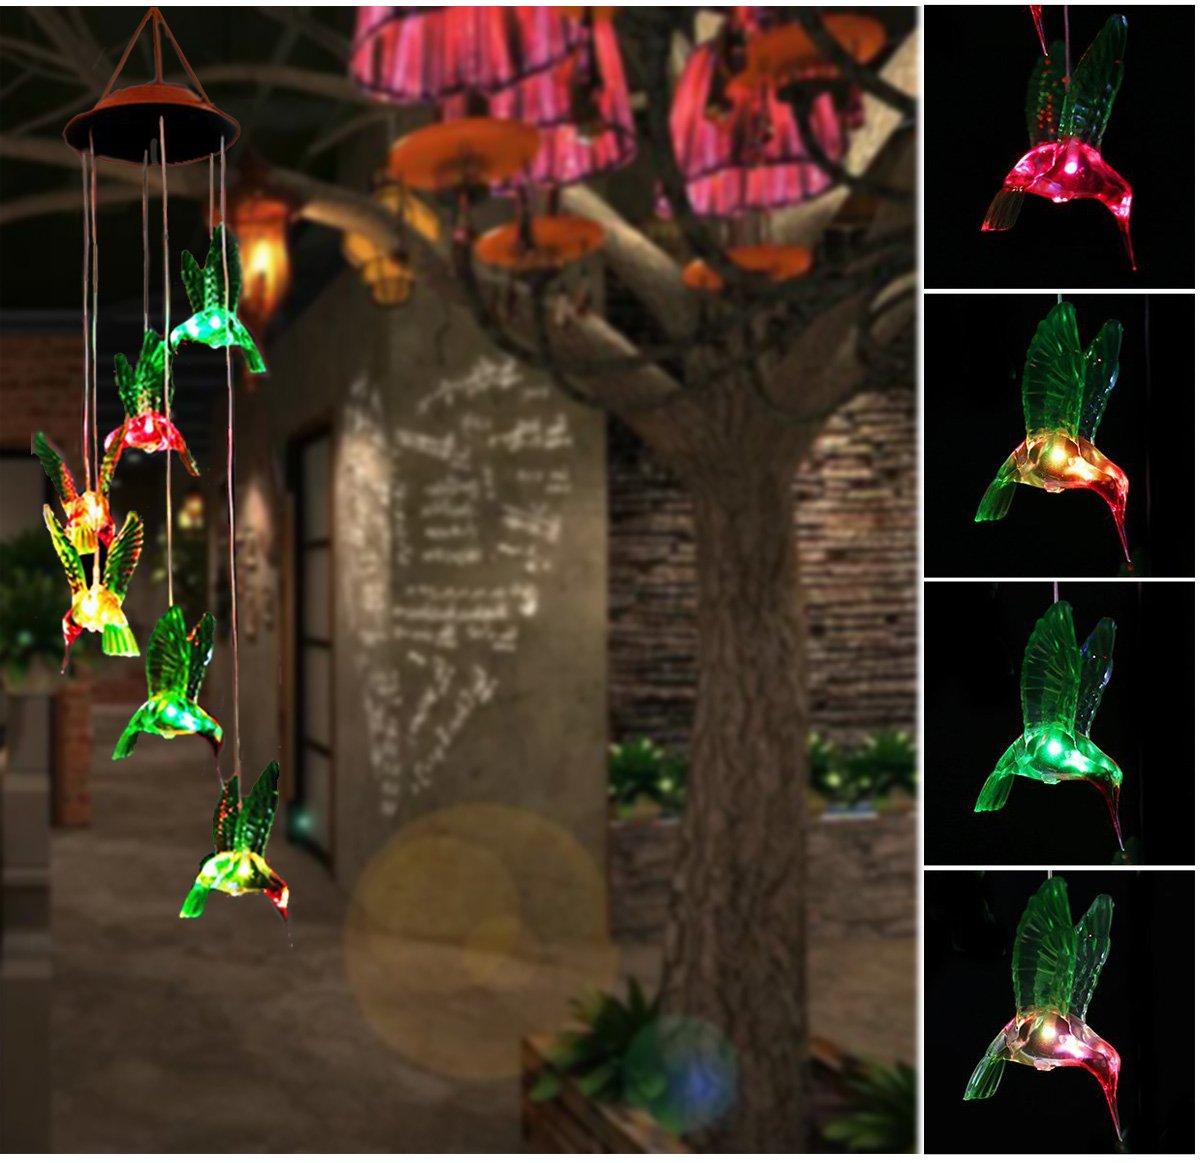 PESTORY Solar LED Hummingbird Wind Chimes Light LED Changing Light Color Waterproof Six Hummingbird for Home/ Garden/ Light Lamp/ Night Garden Decoration